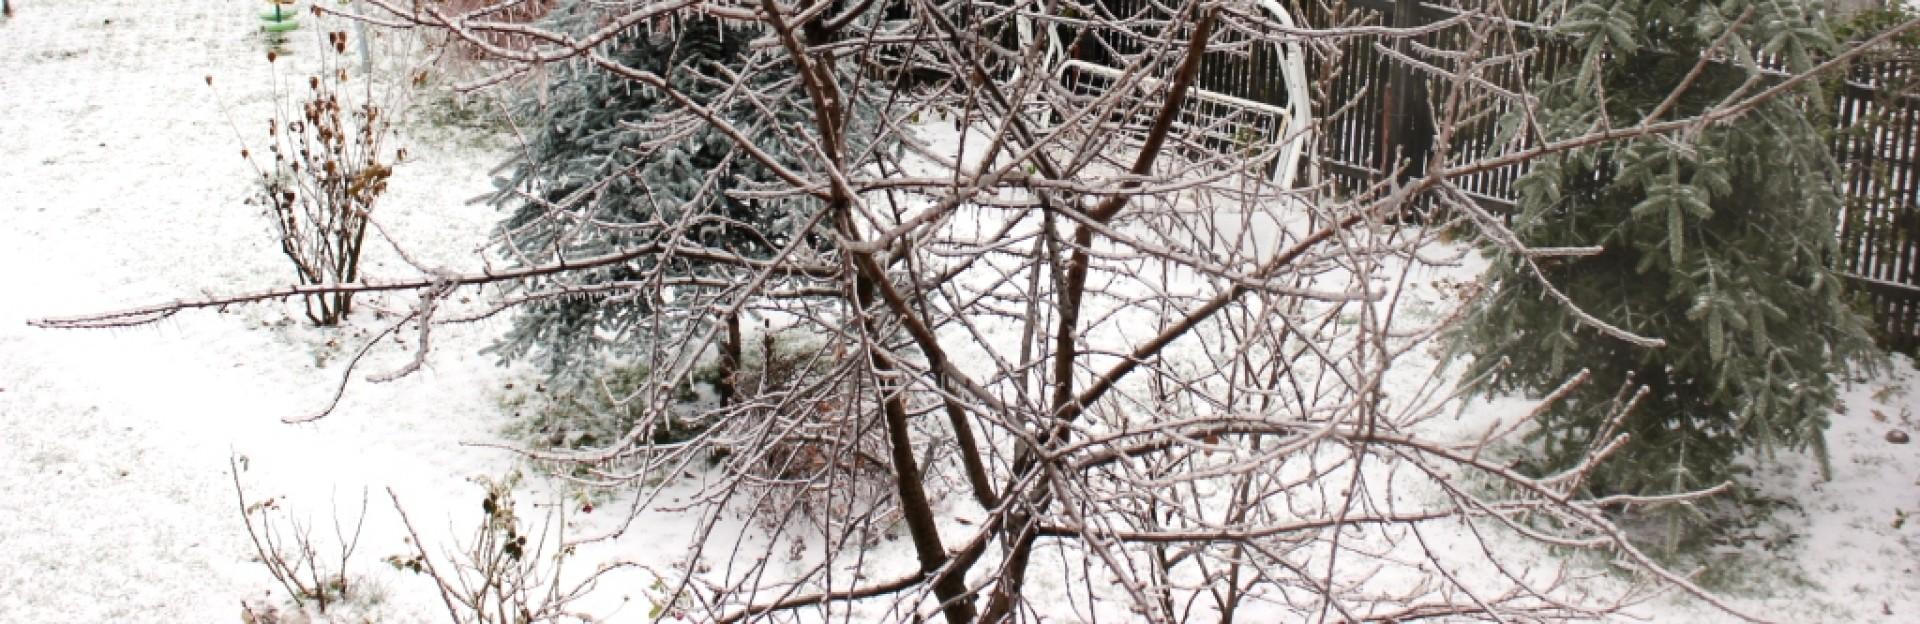 cropped-iarna-01.12.2014.jpg